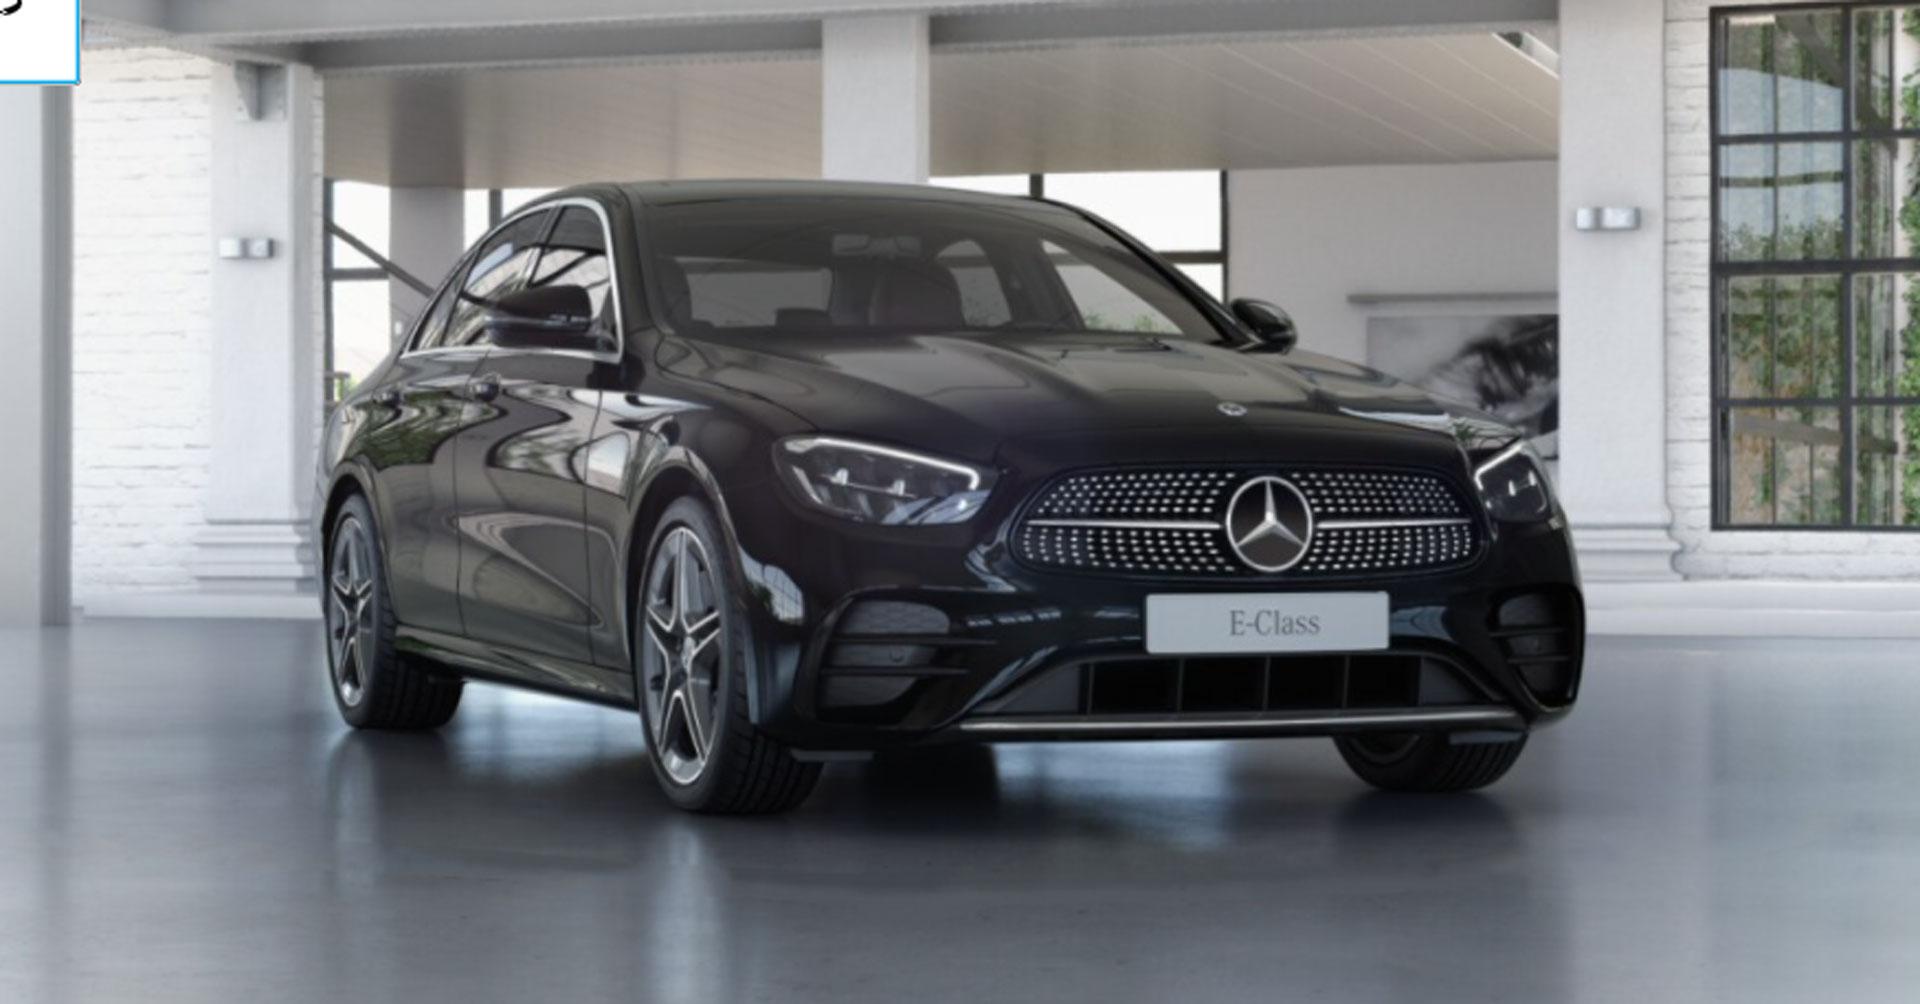 Mercedes-Benz E-Class Limousine 0152680053